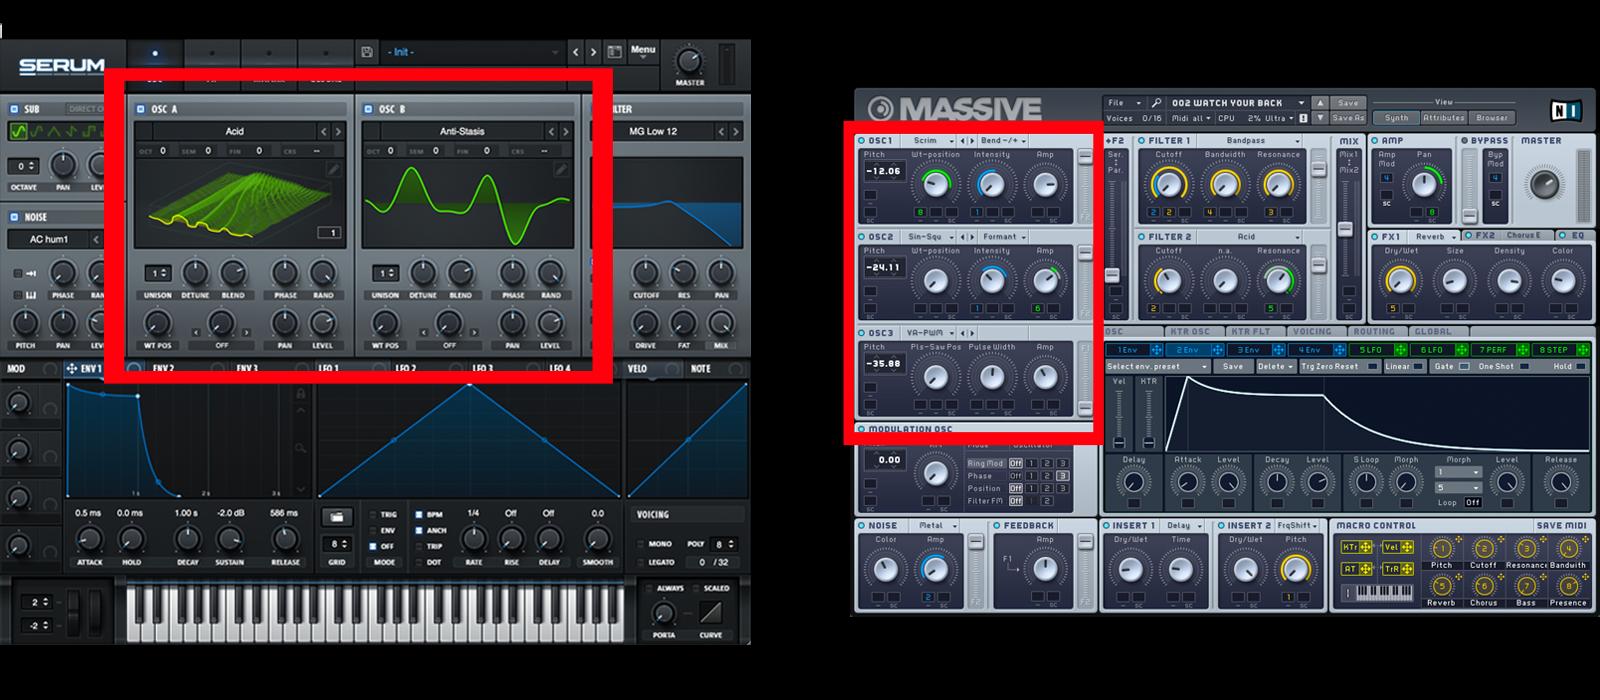 Sound Design Serum & Massive - Music Producer Tutorial | Bass Kleph